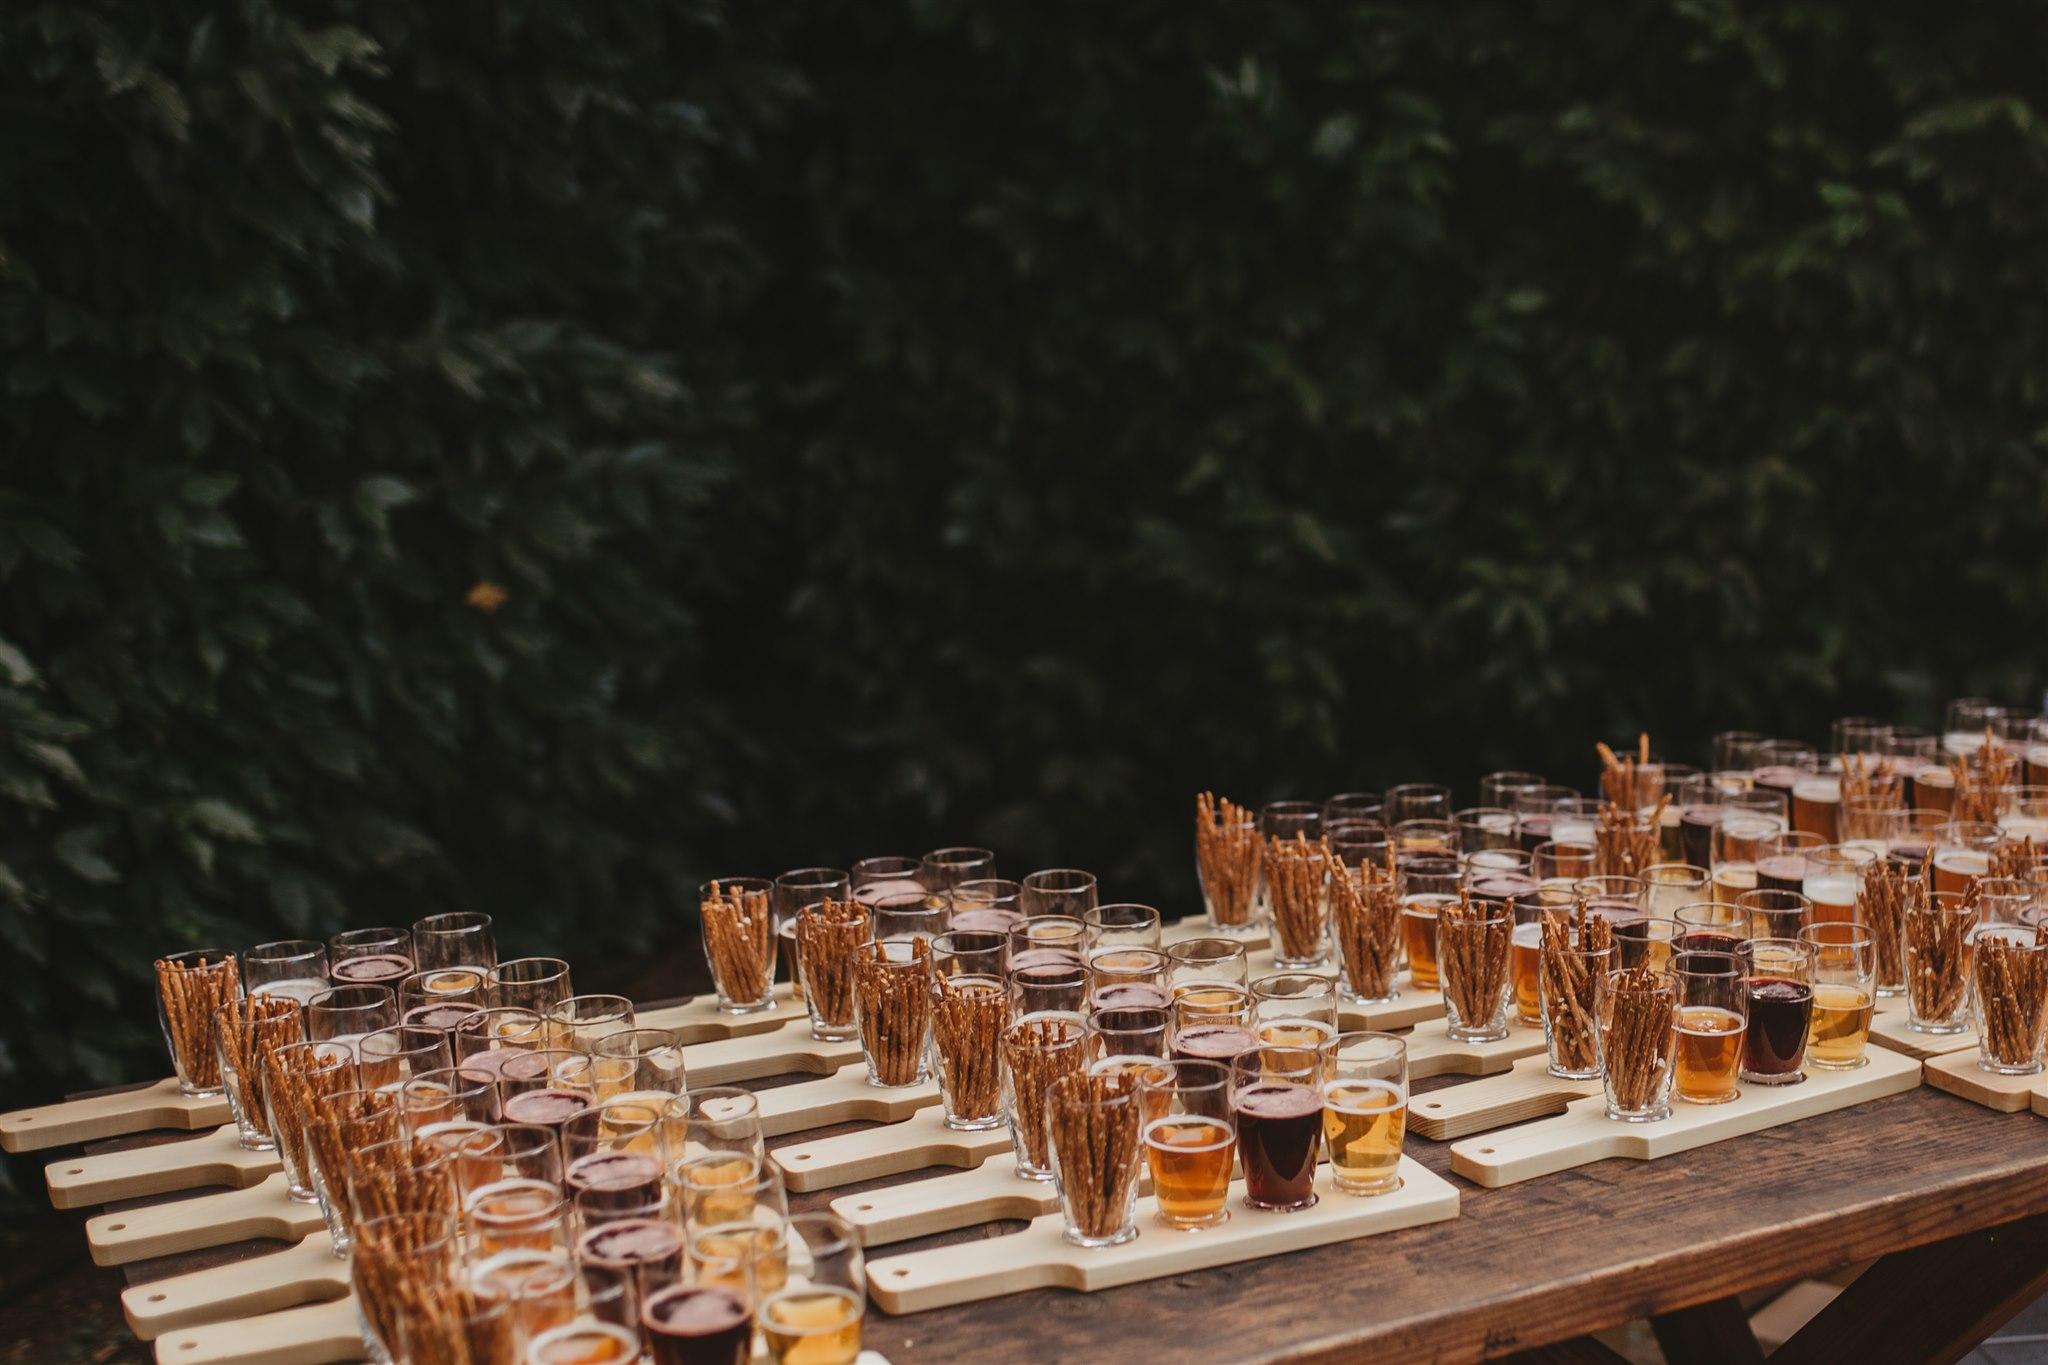 brittany-nathan-indwell-wedding-939.jpg